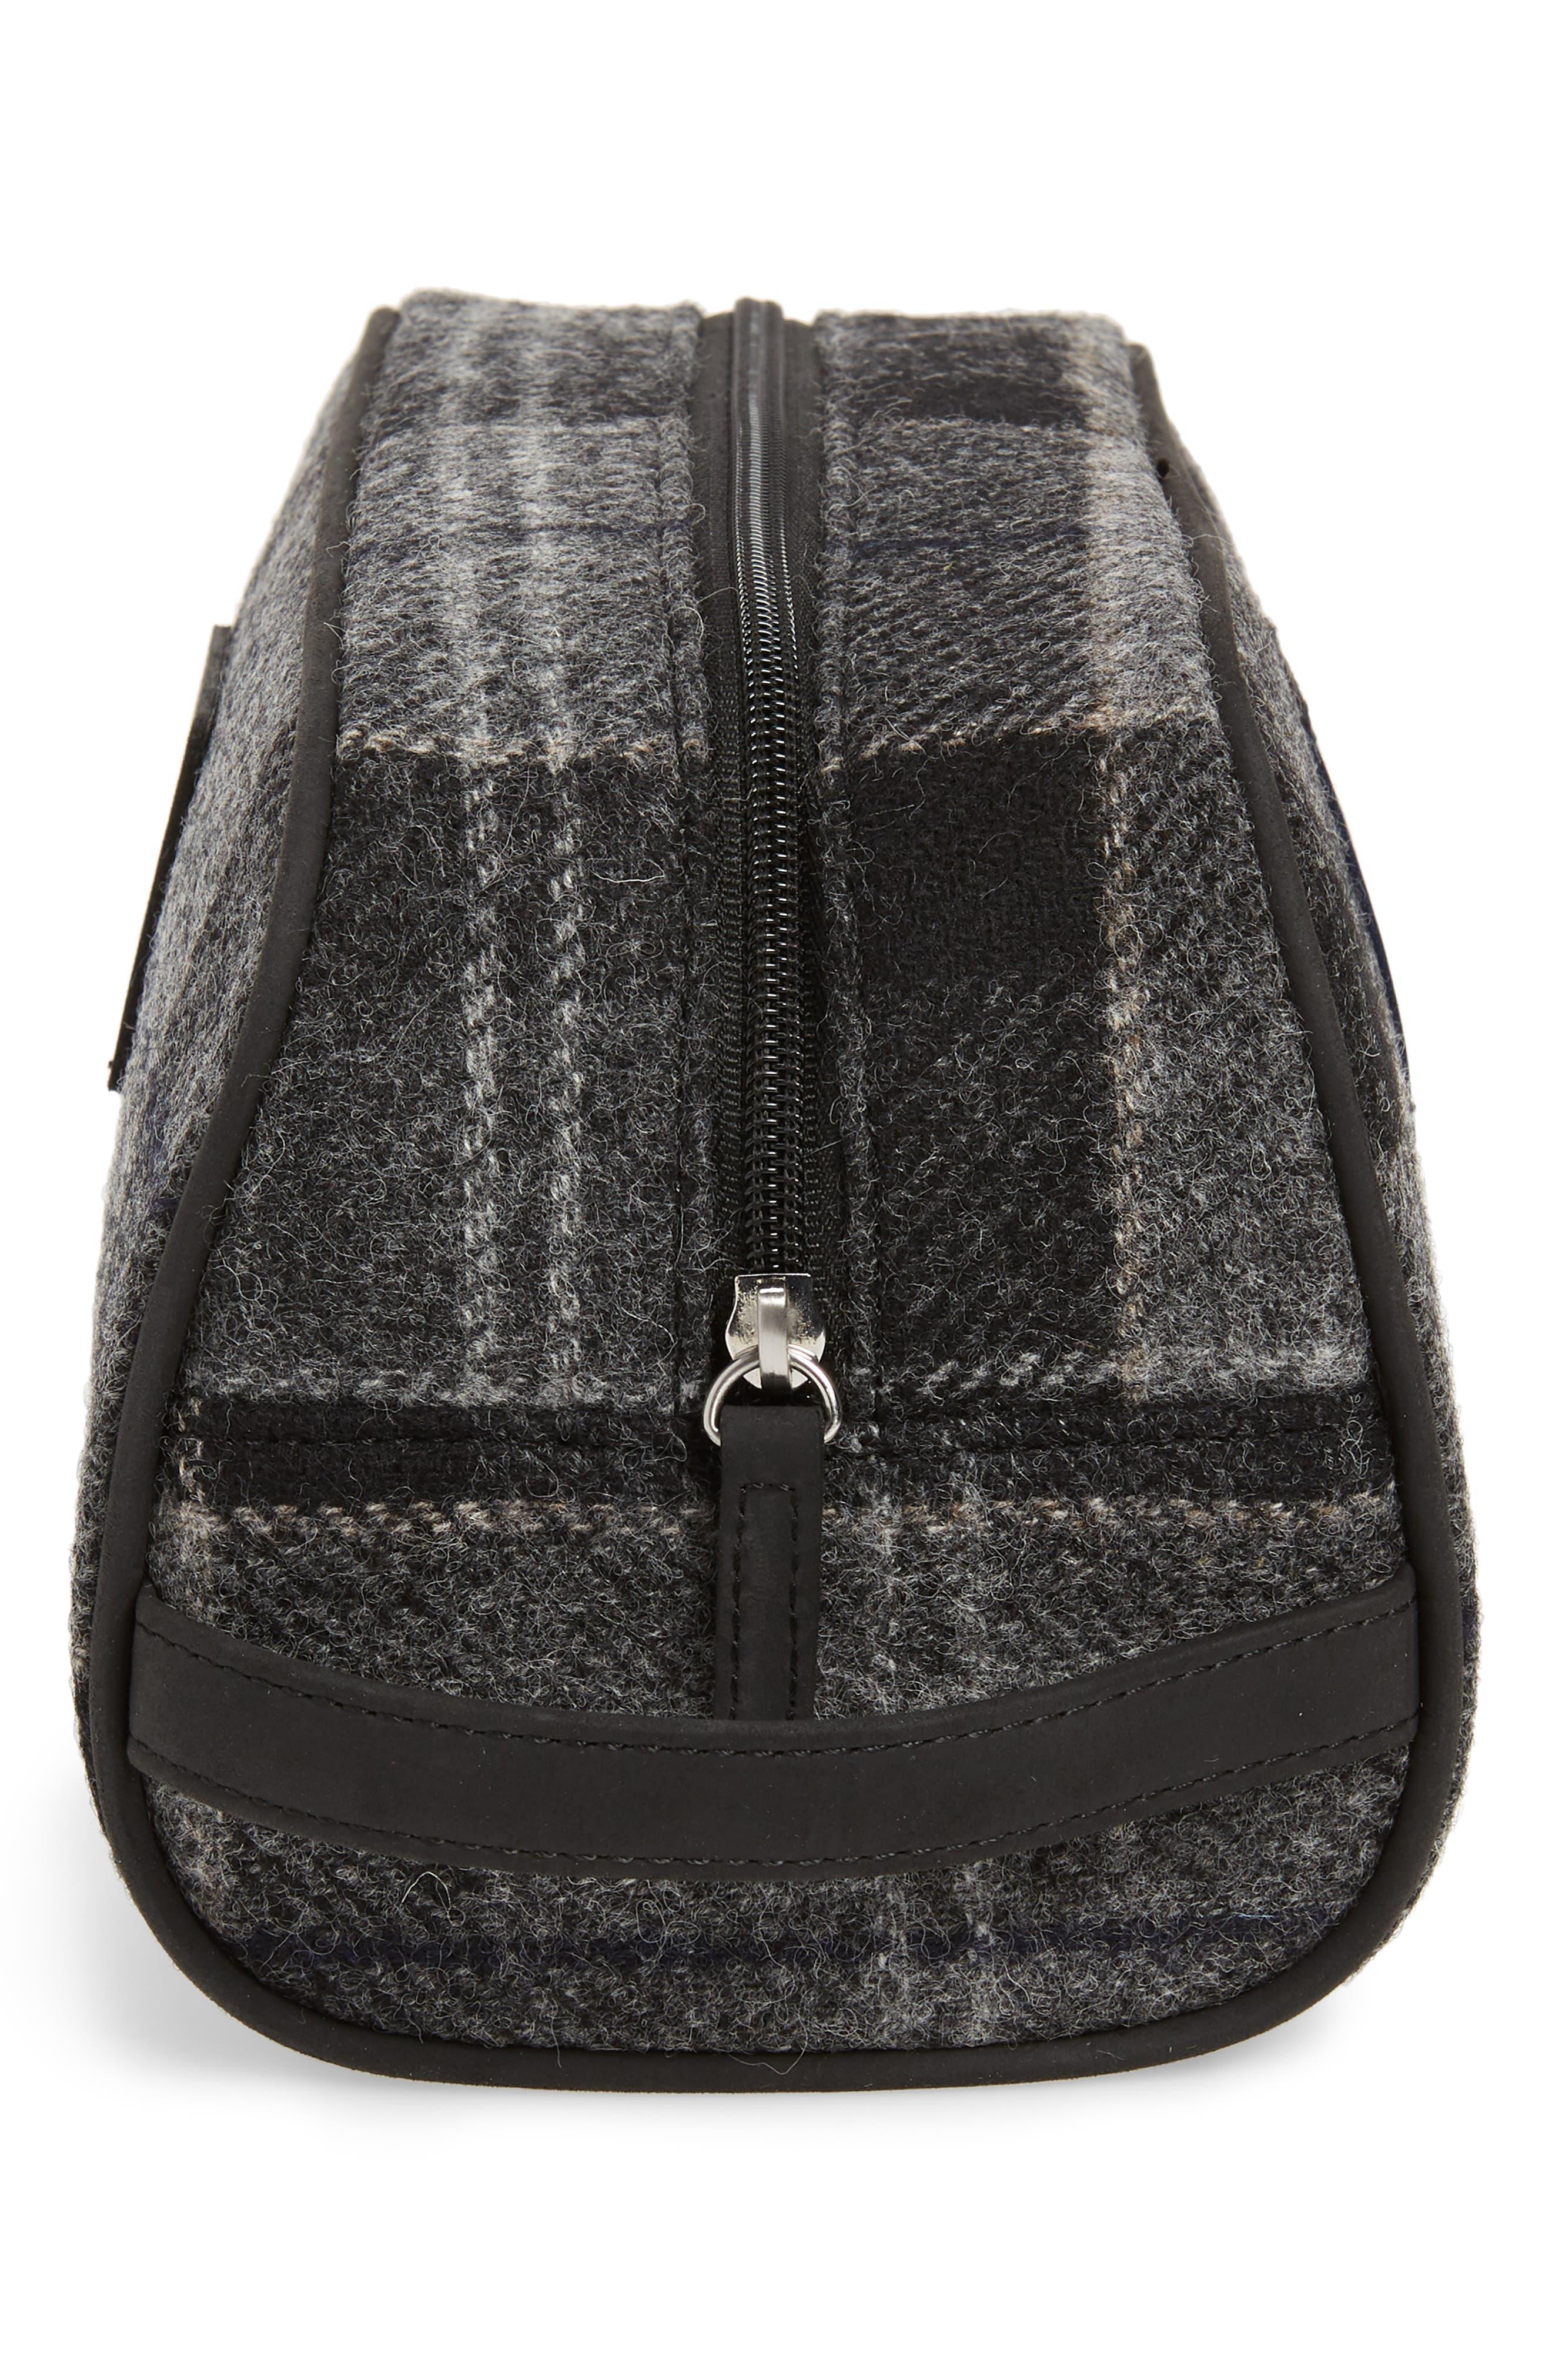 Shadow Tartan Wool Travel Kit,                             Alternate thumbnail 4, color,                             BLACK/ GREY TARTAN